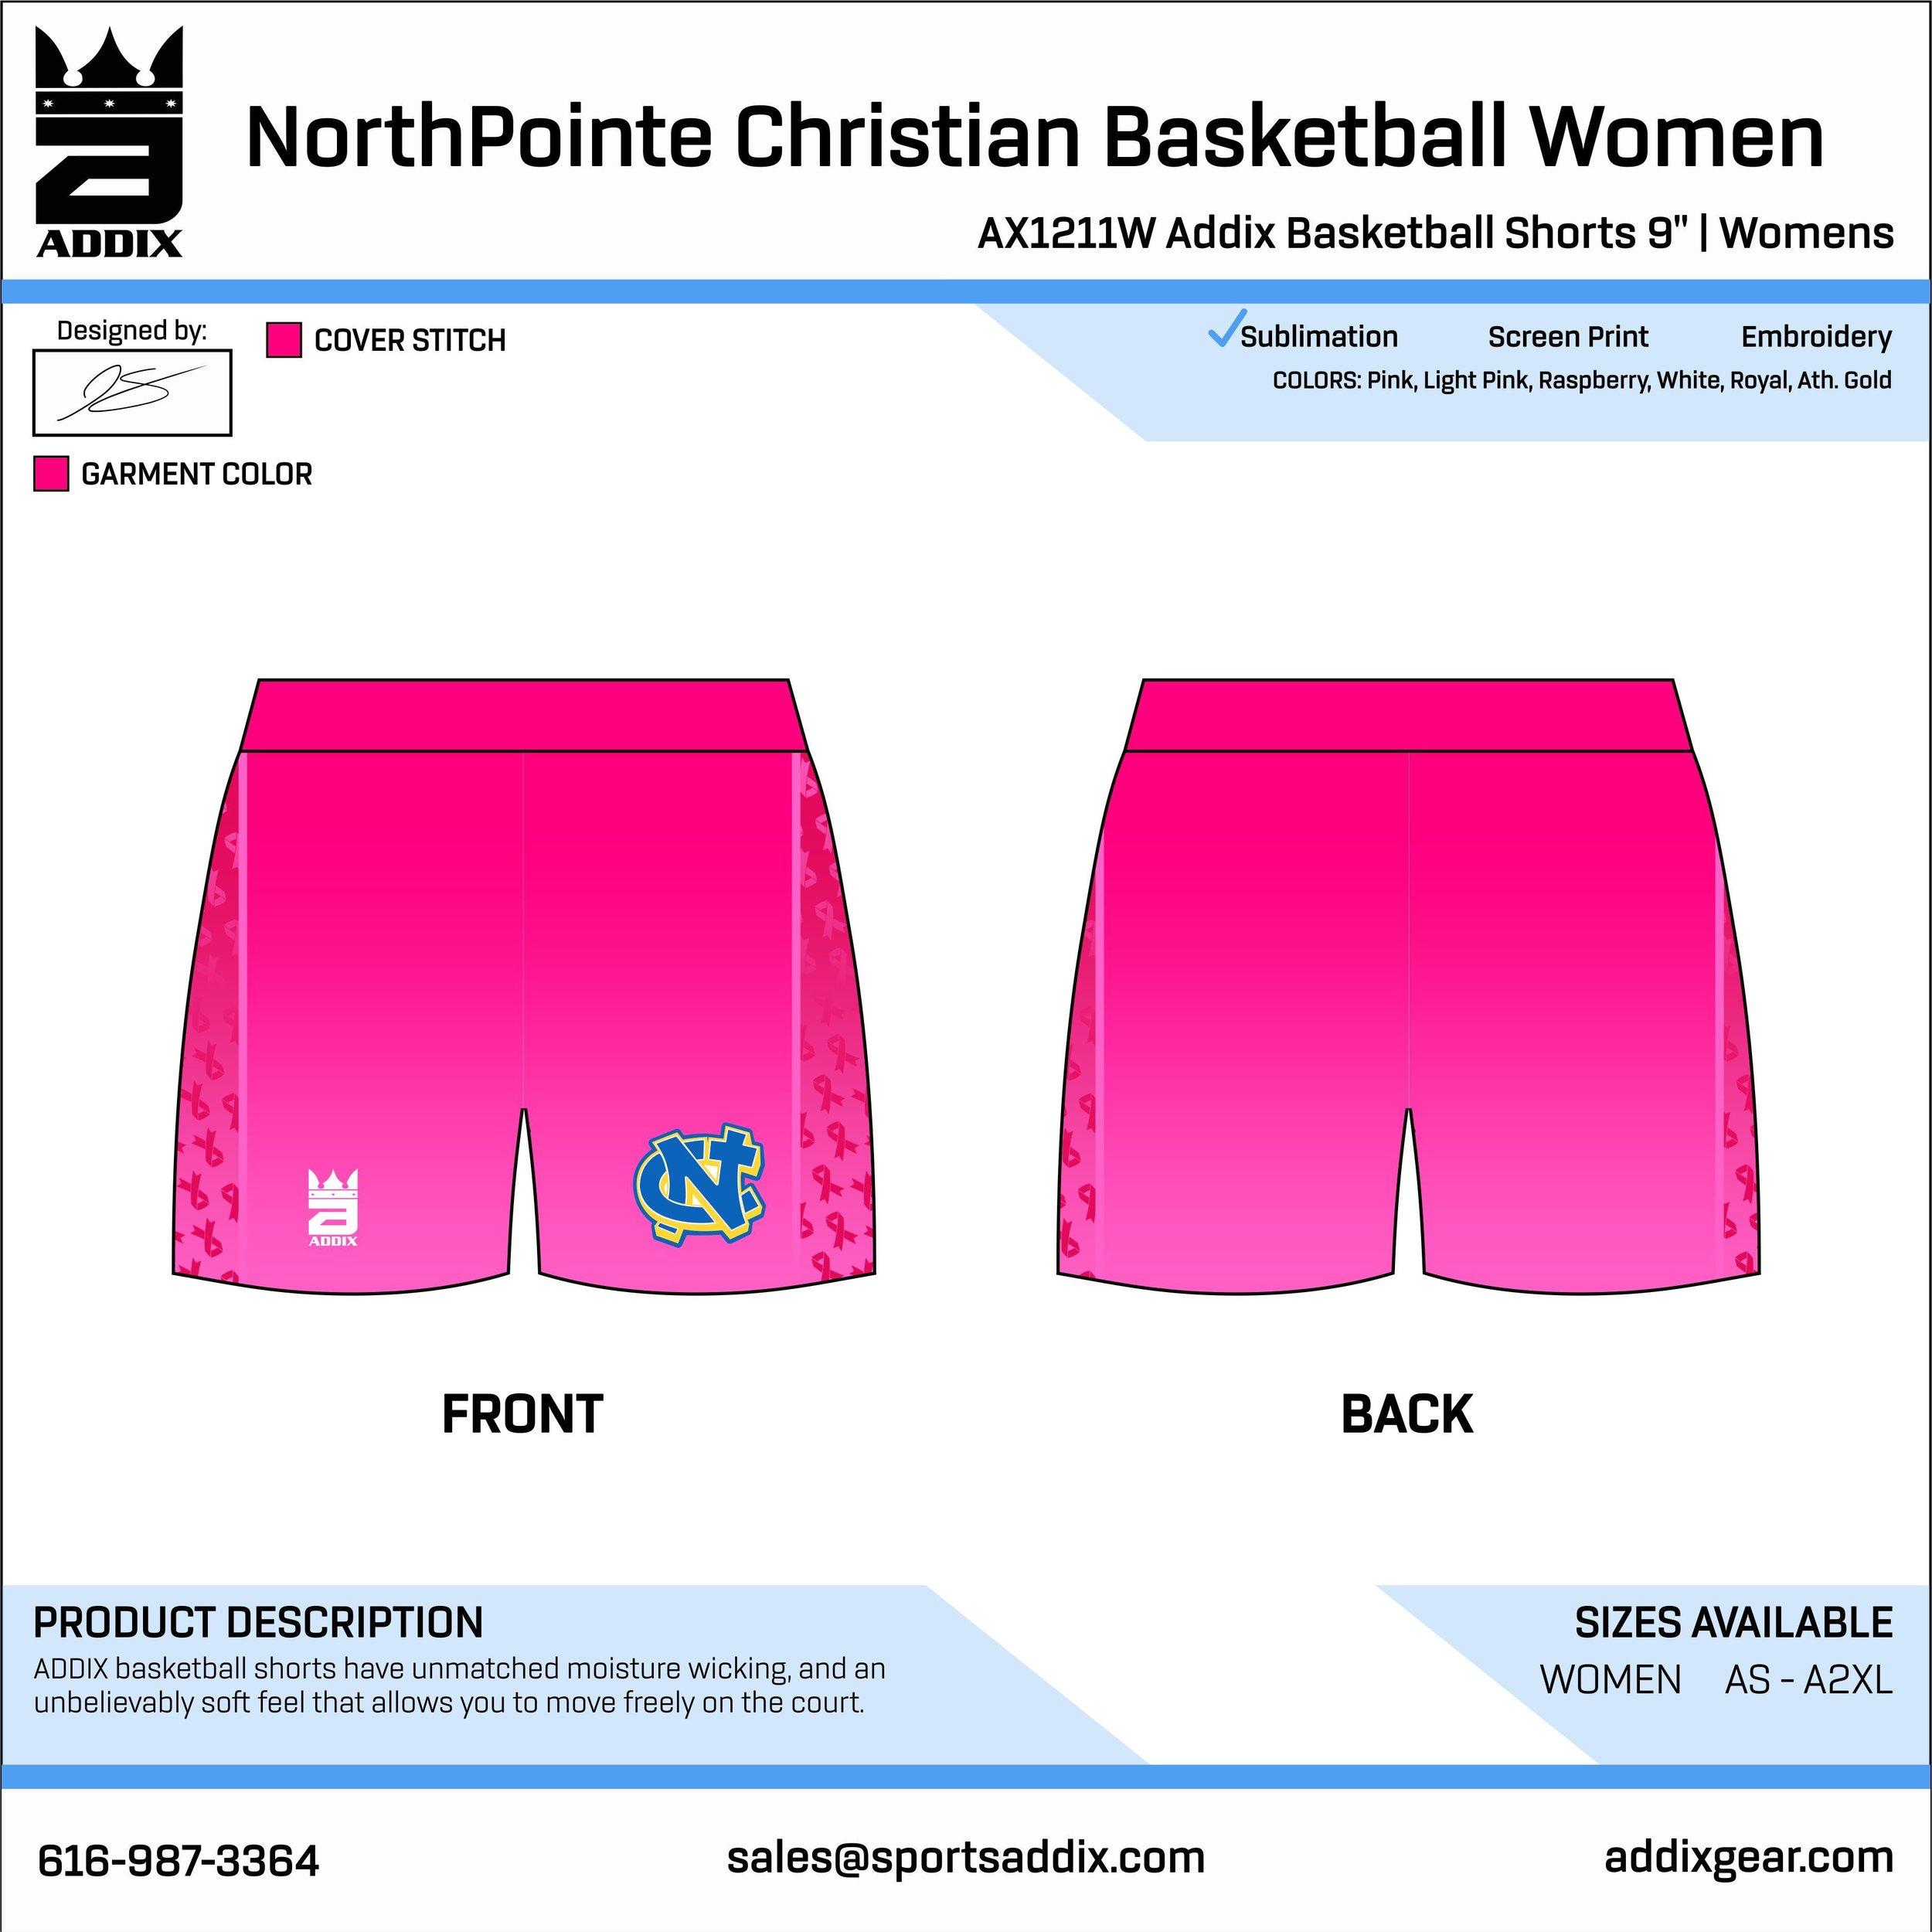 NorthPointe Christian Basketball Women_2018_2-13_JE_Basketball Shorts V2.jpg